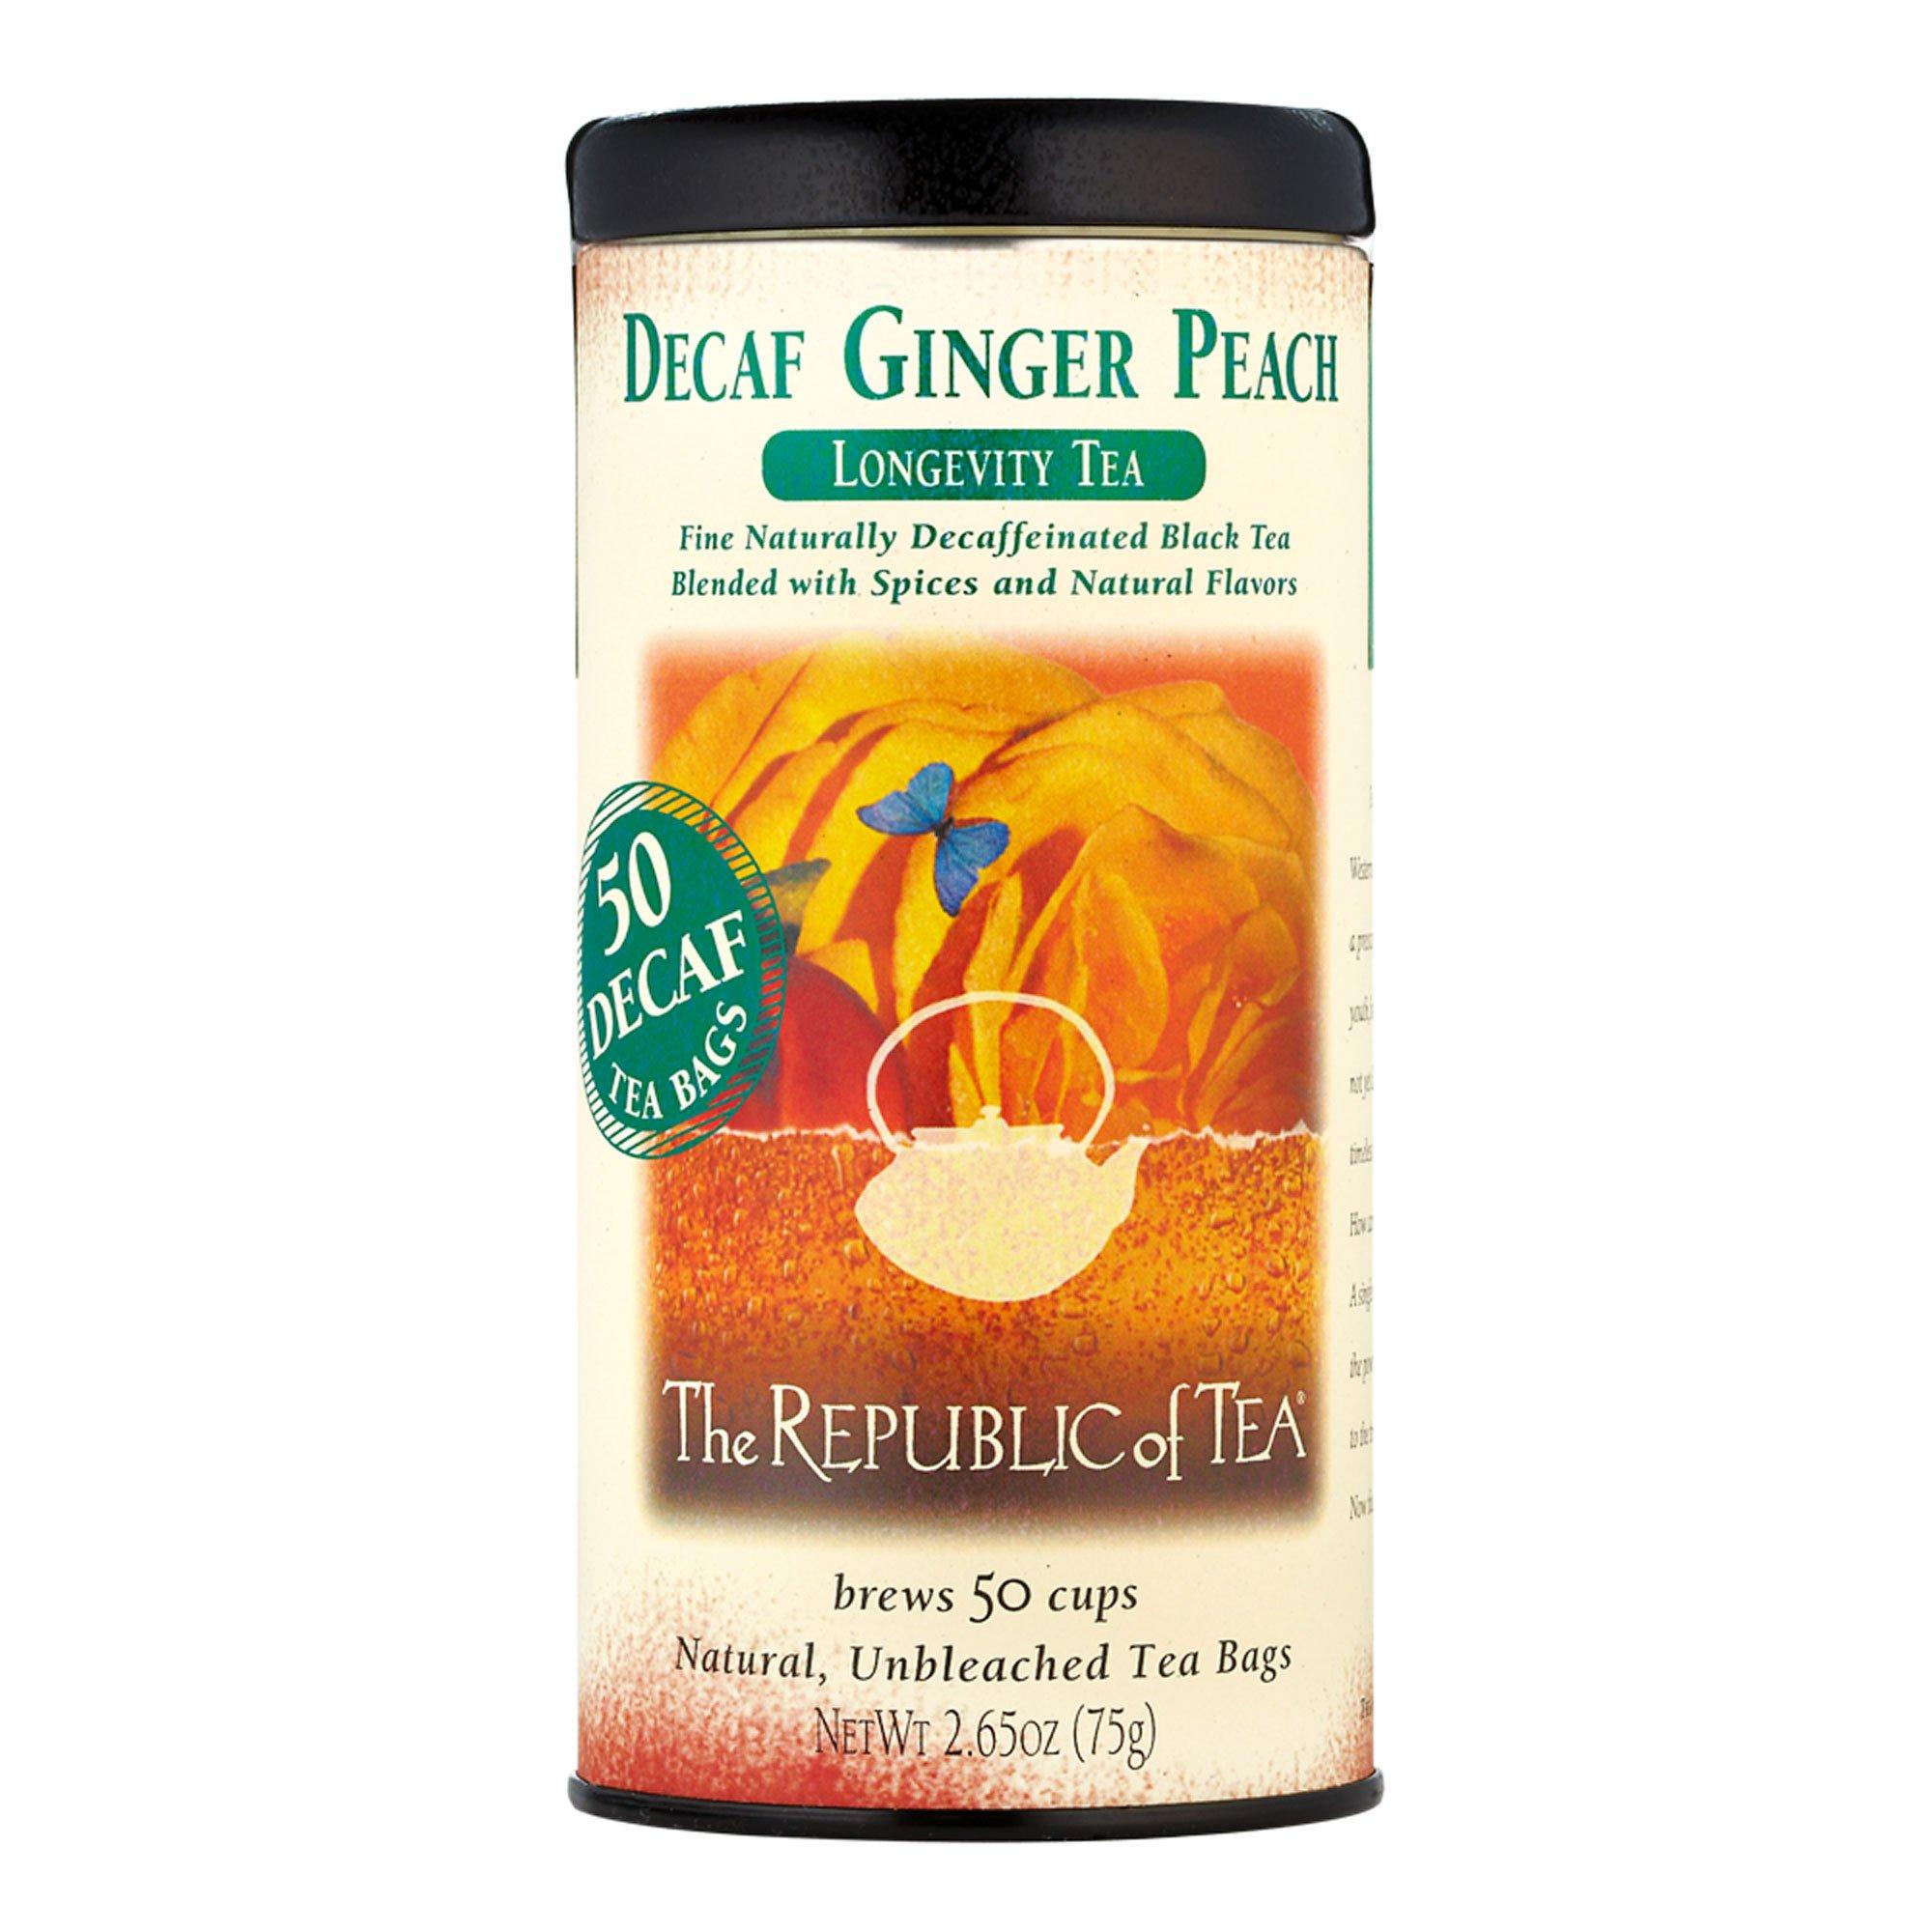 The Republic Of Tea Decaf Ginger Peach Black Tea, 50 Tea Bags, Longevity Blend Of Ginger And Peach Tea by The Republic of Tea (Image #1)